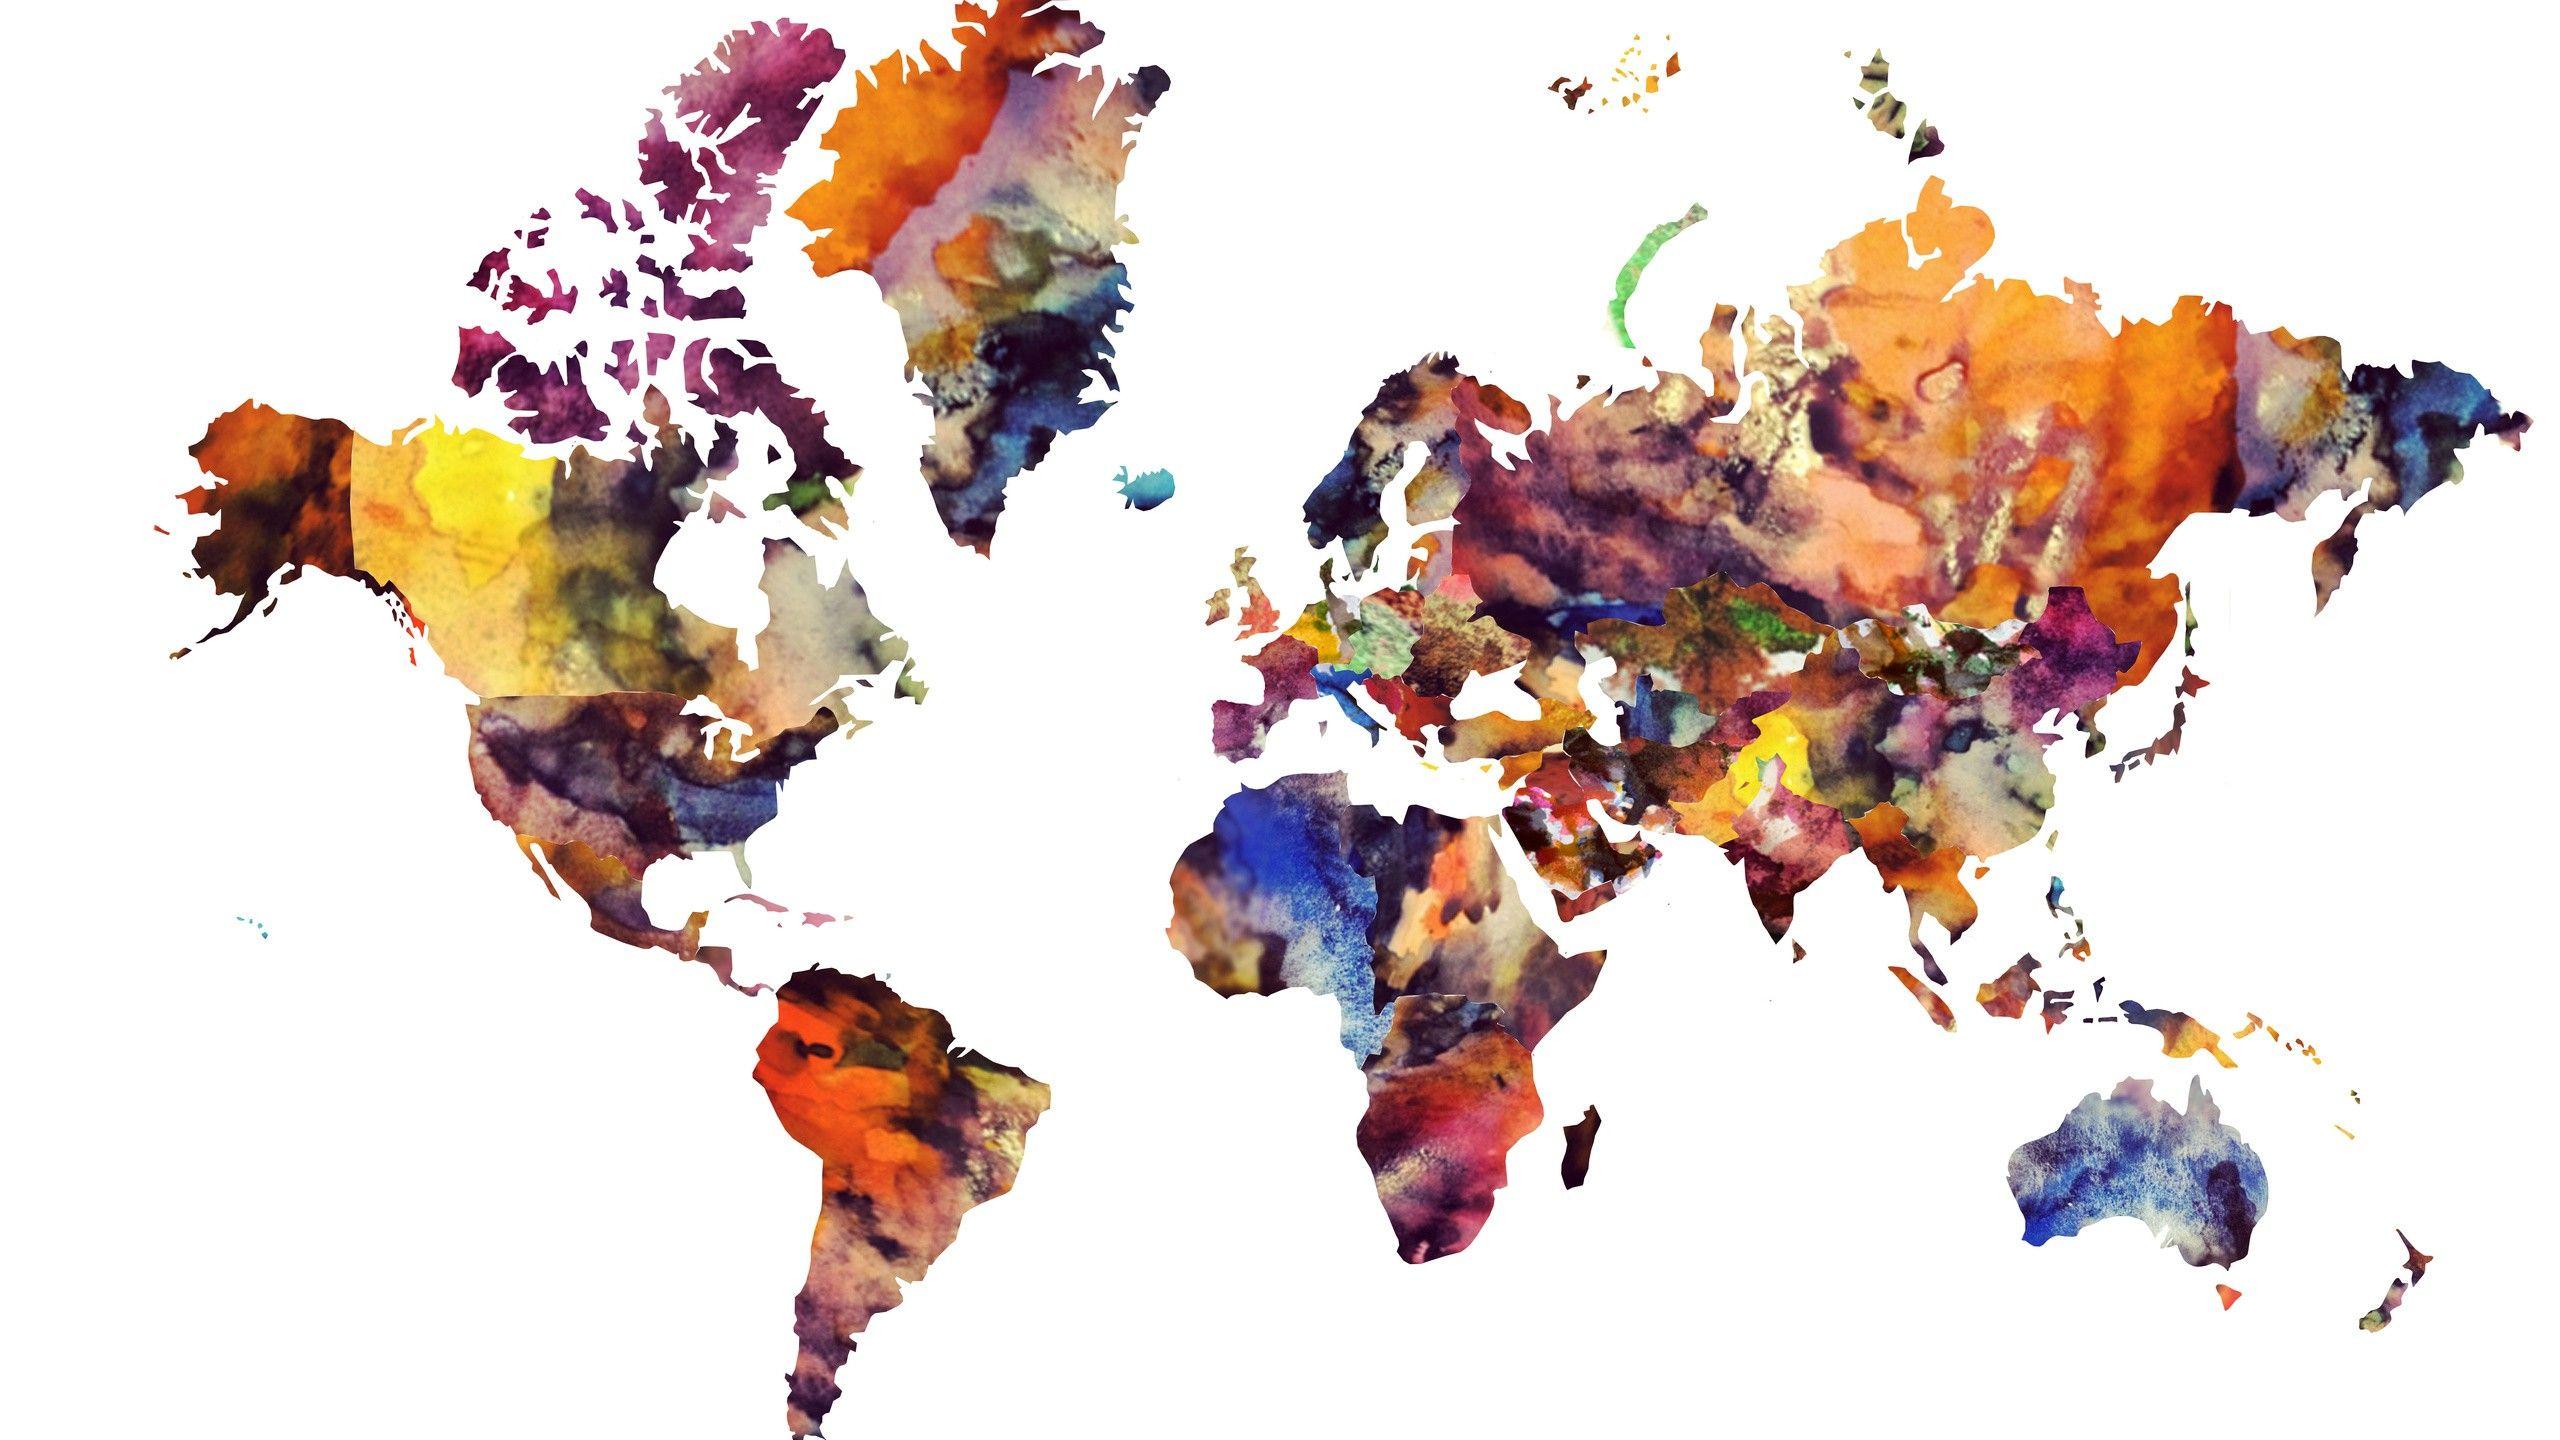 World Map Watercolor Wallpaper Inspirationa Maps World Map